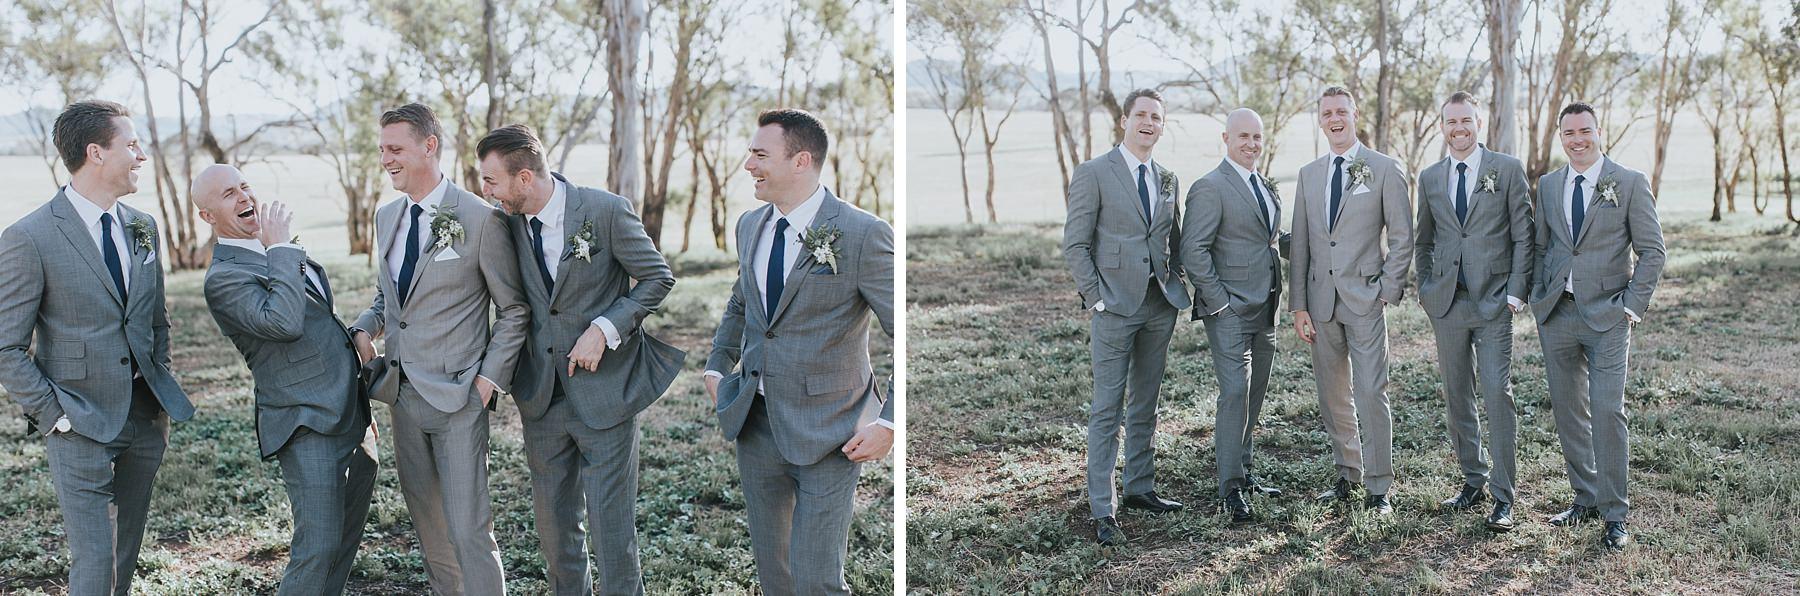 mudgee groomsmen photos